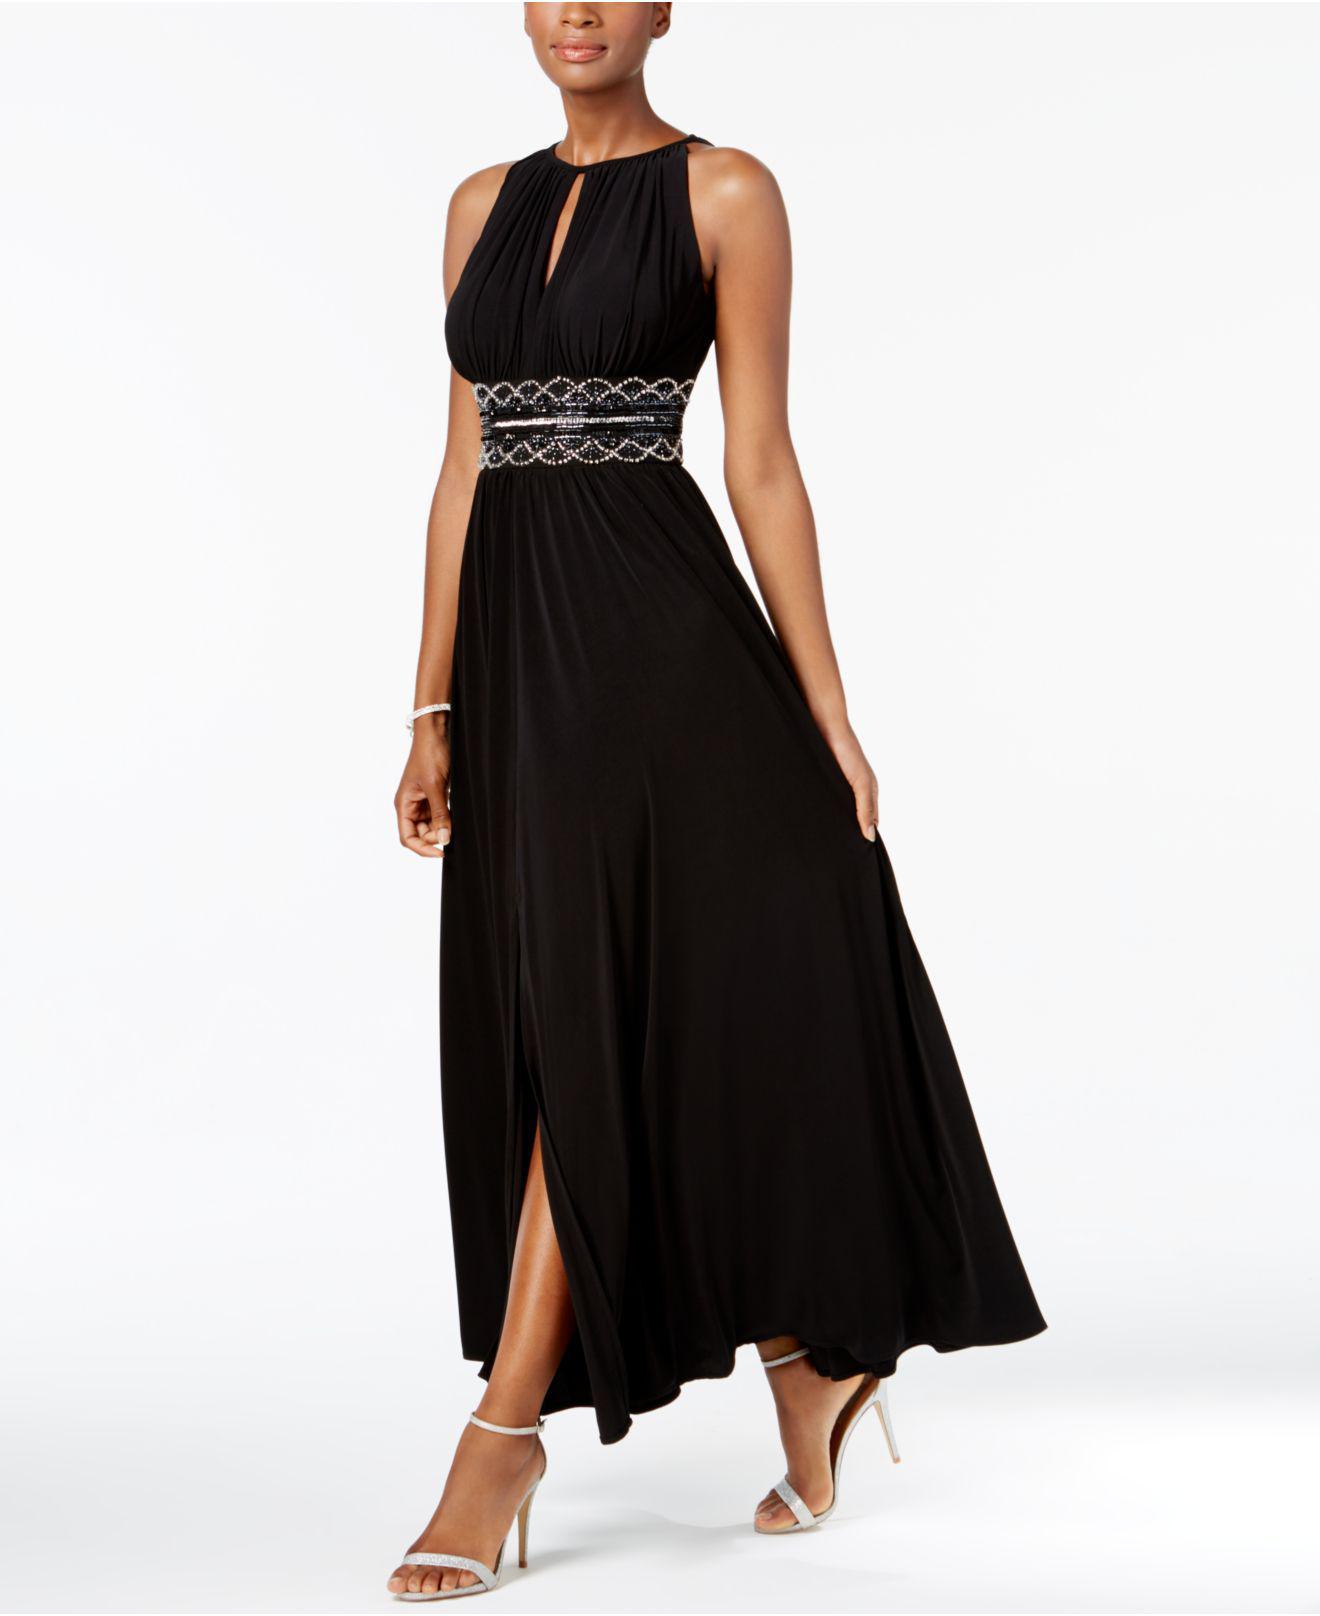 Lyst - R & M Richards Dress, Sleeveless Beaded Evening Gown in Black